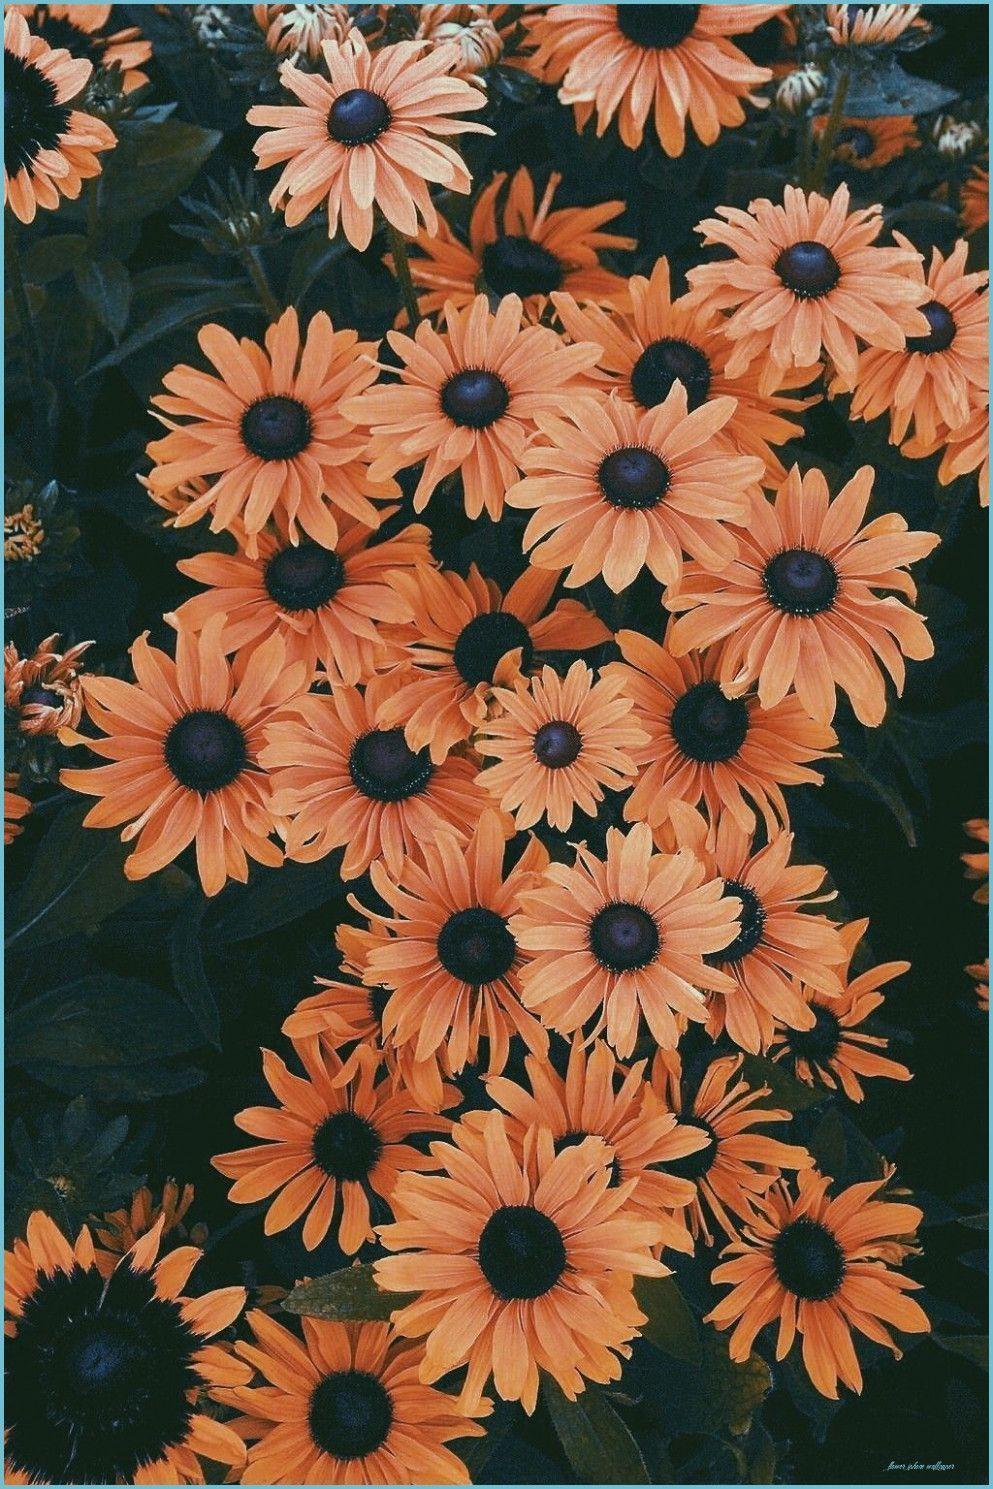 Brown Floral Iphone Wallpapers Top Free Brown Floral Iphone Backgrounds Wallpaperaccess